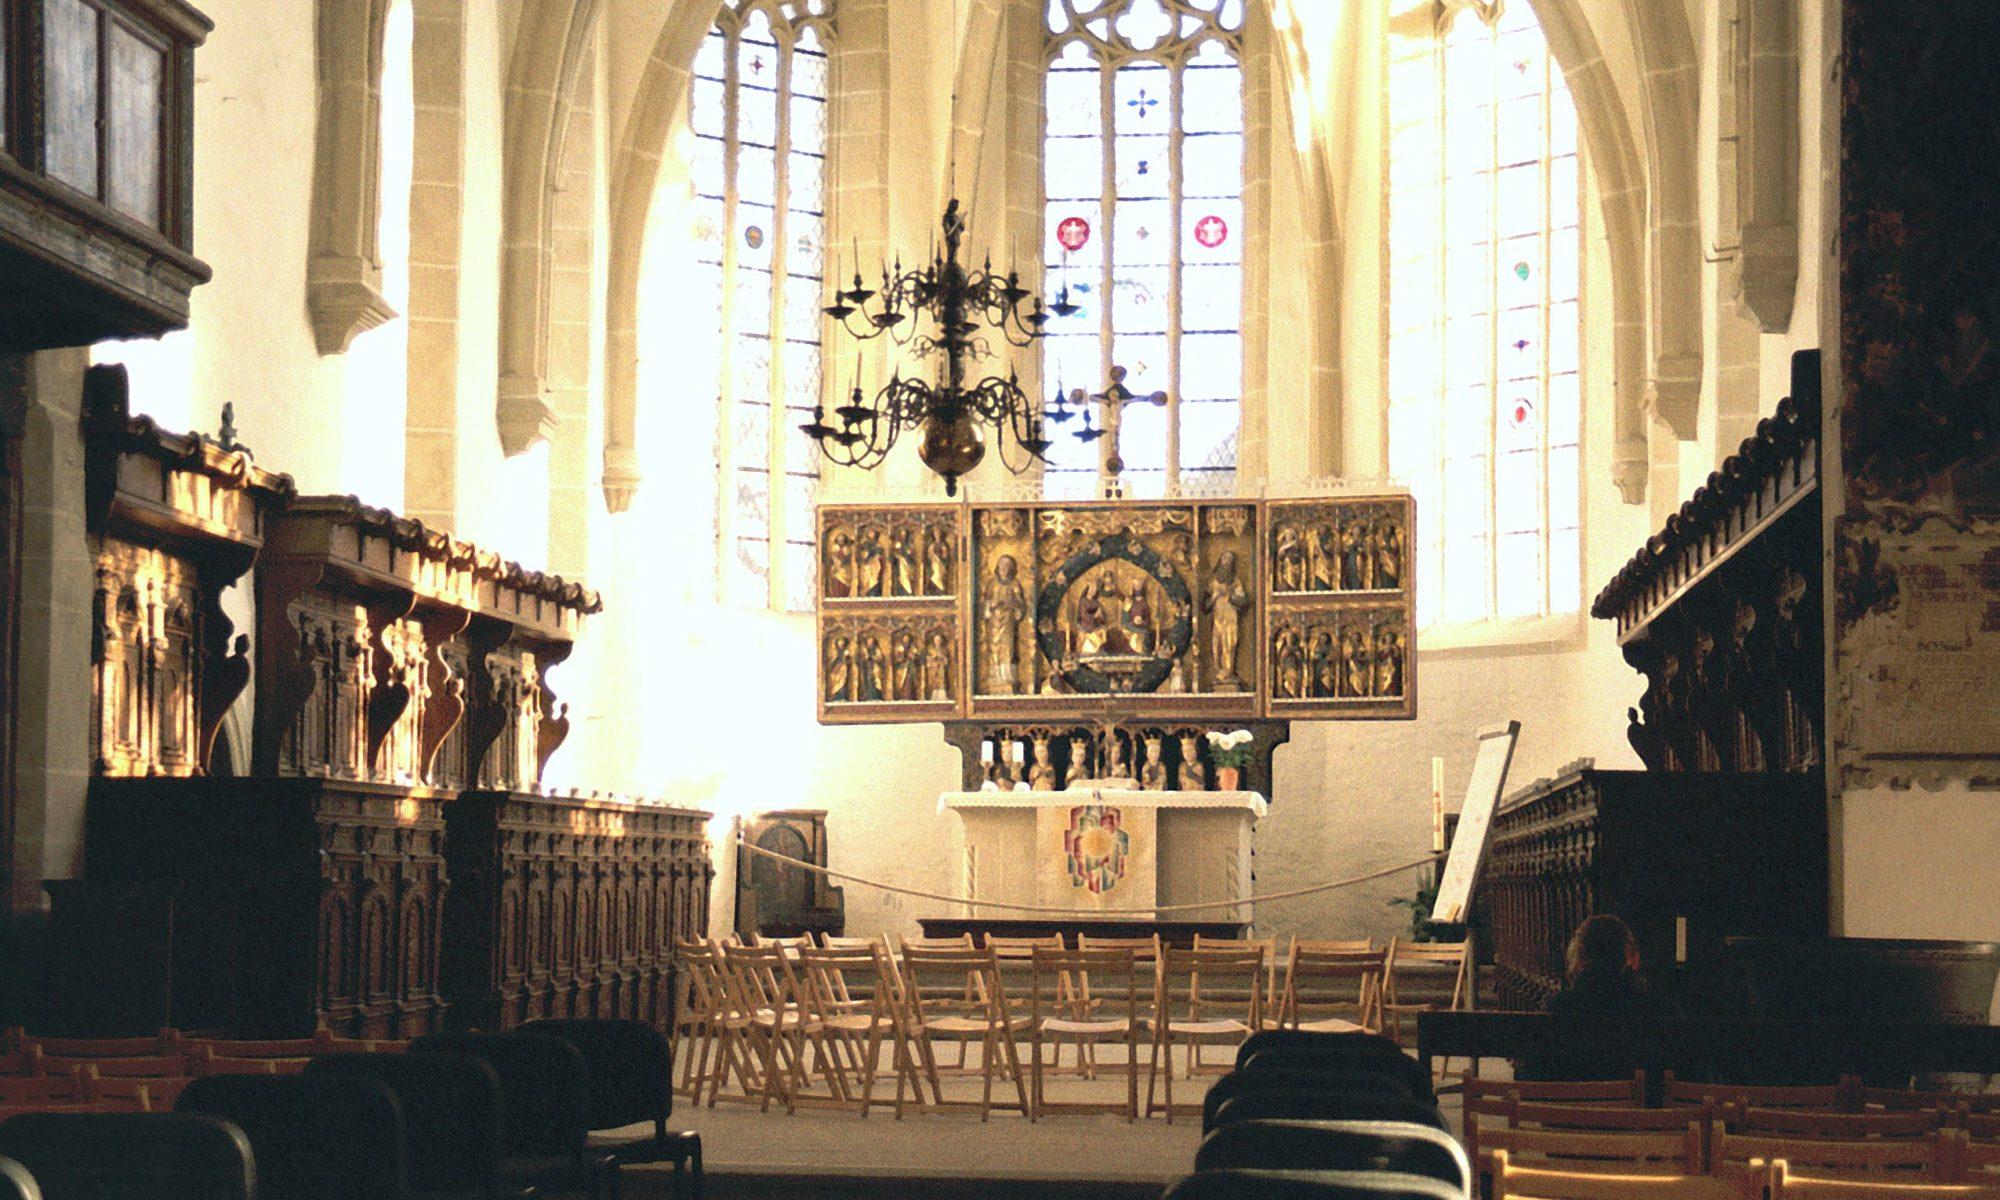 St. Stephani Kirche Osterwieck Altarraum (c) Wikimedia Commons